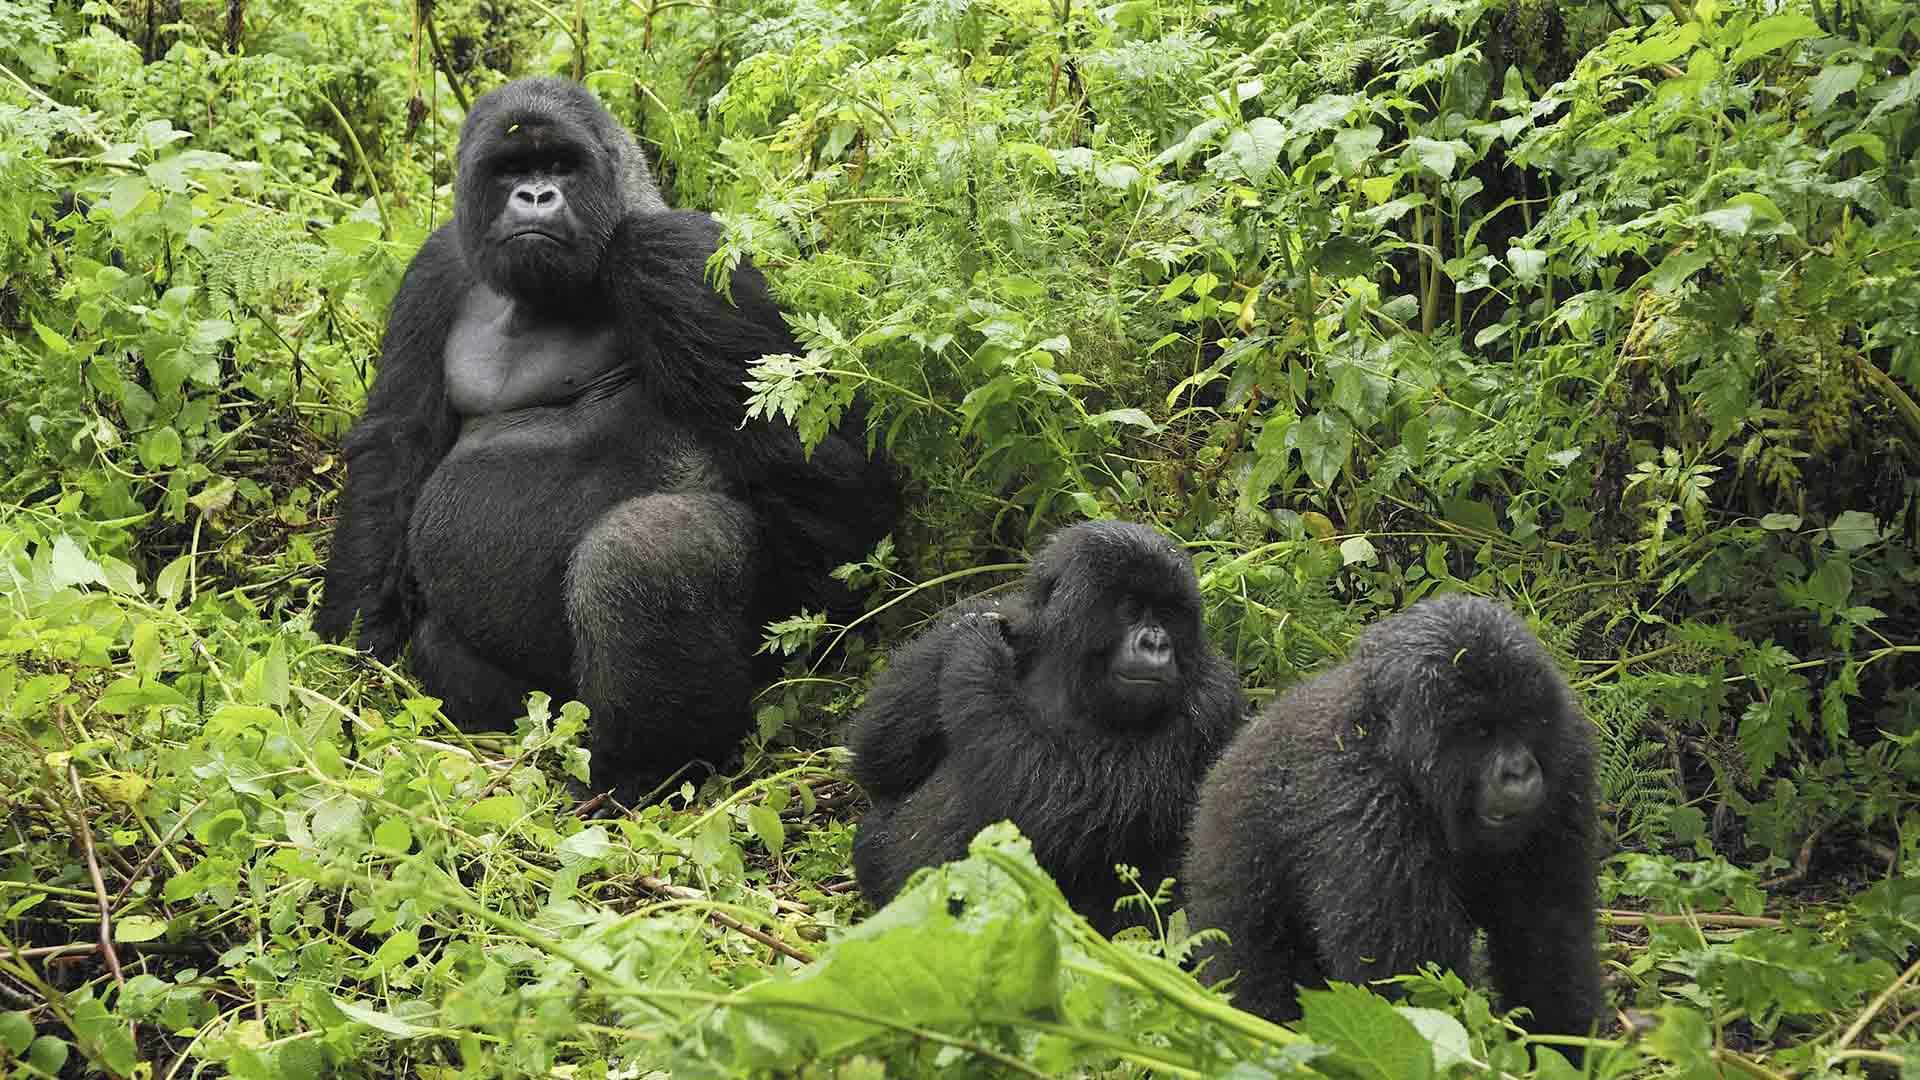 How big are gorillas - gorilla size, the size of gorillas